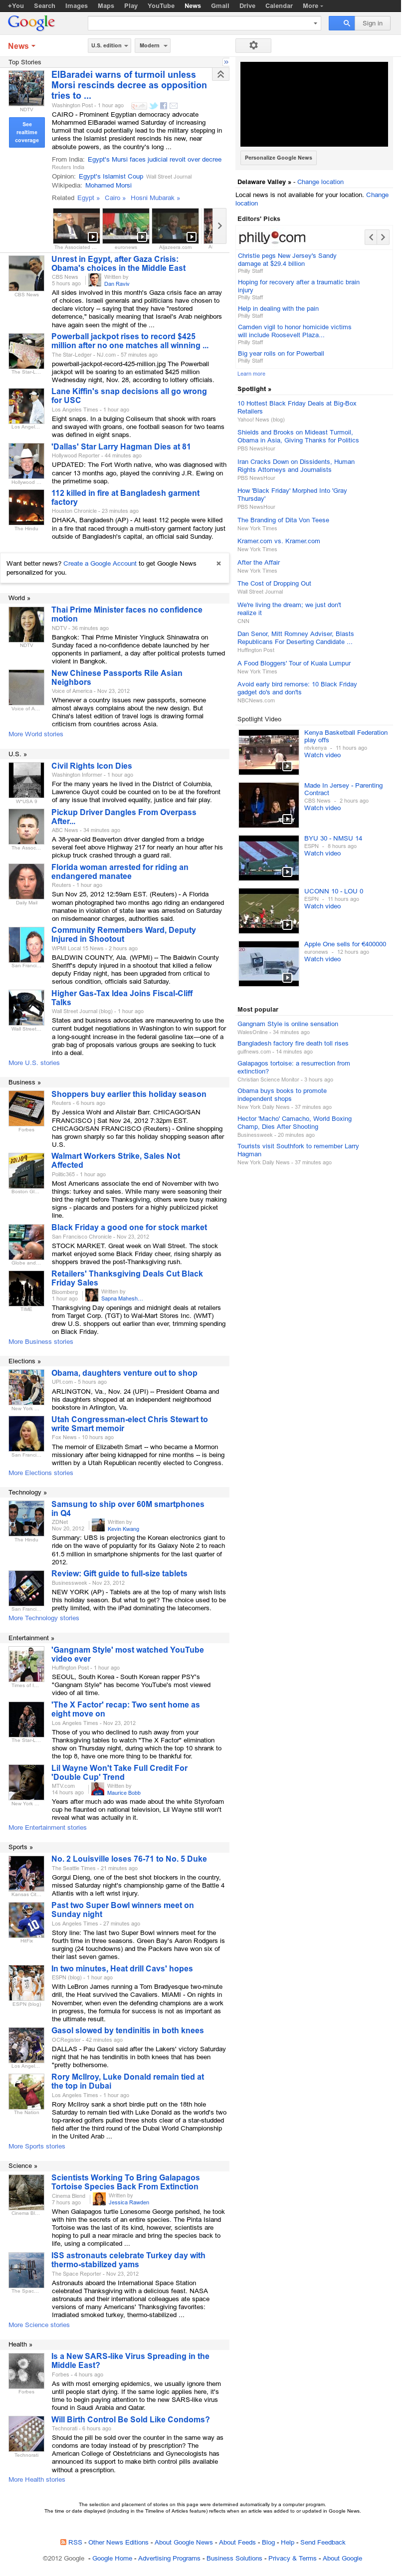 Google News at Sunday Nov. 25, 2012, 7:11 a.m. UTC